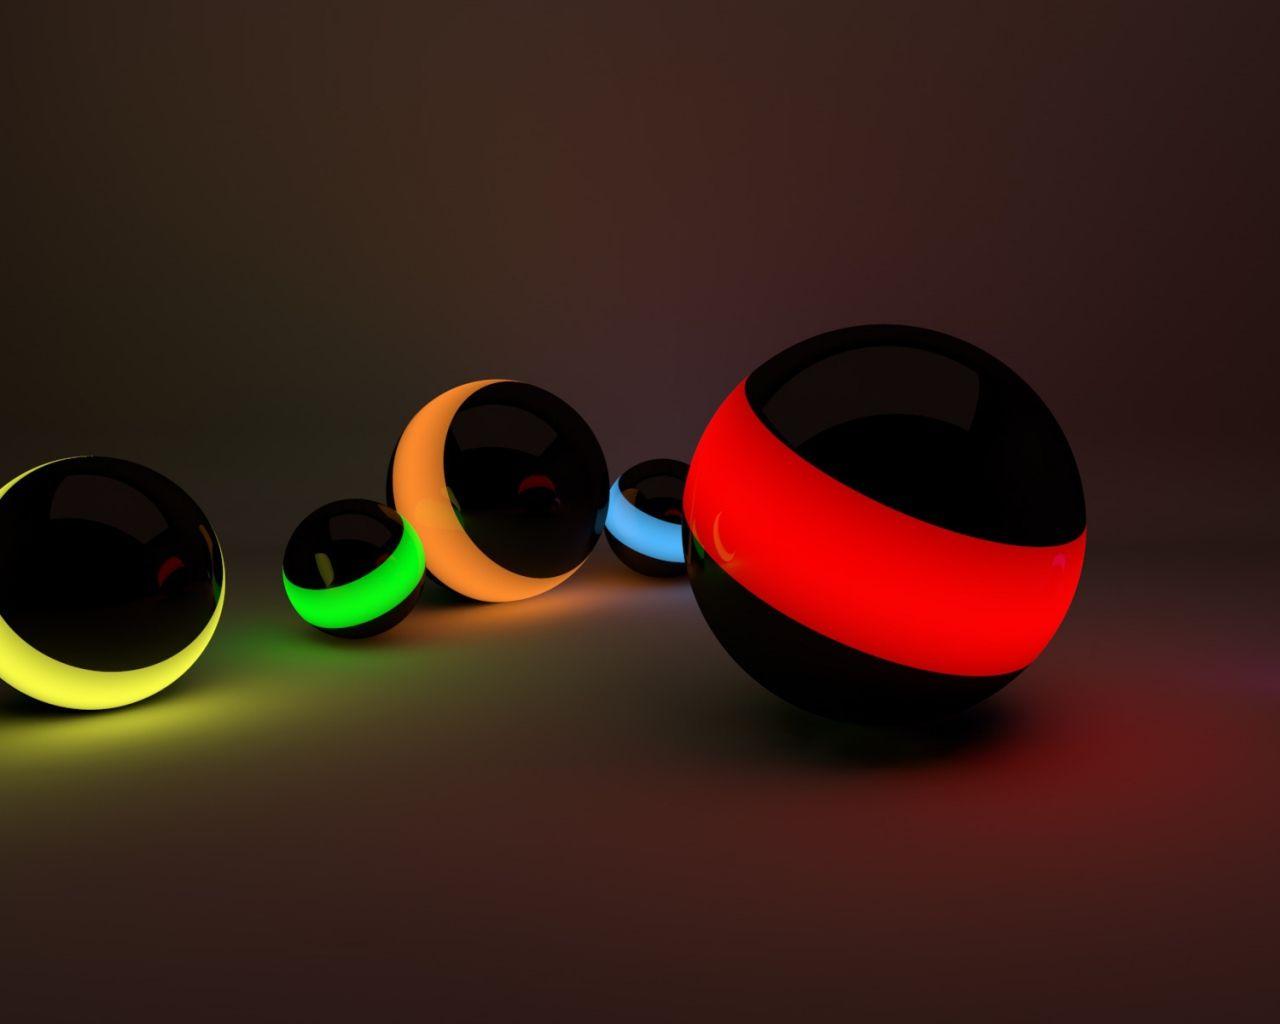 1280x1024 Wallpaper Balls Lines Neon Lights Hd Wallpapers For Laptop Laptop Wallpaper Desktop Pictures